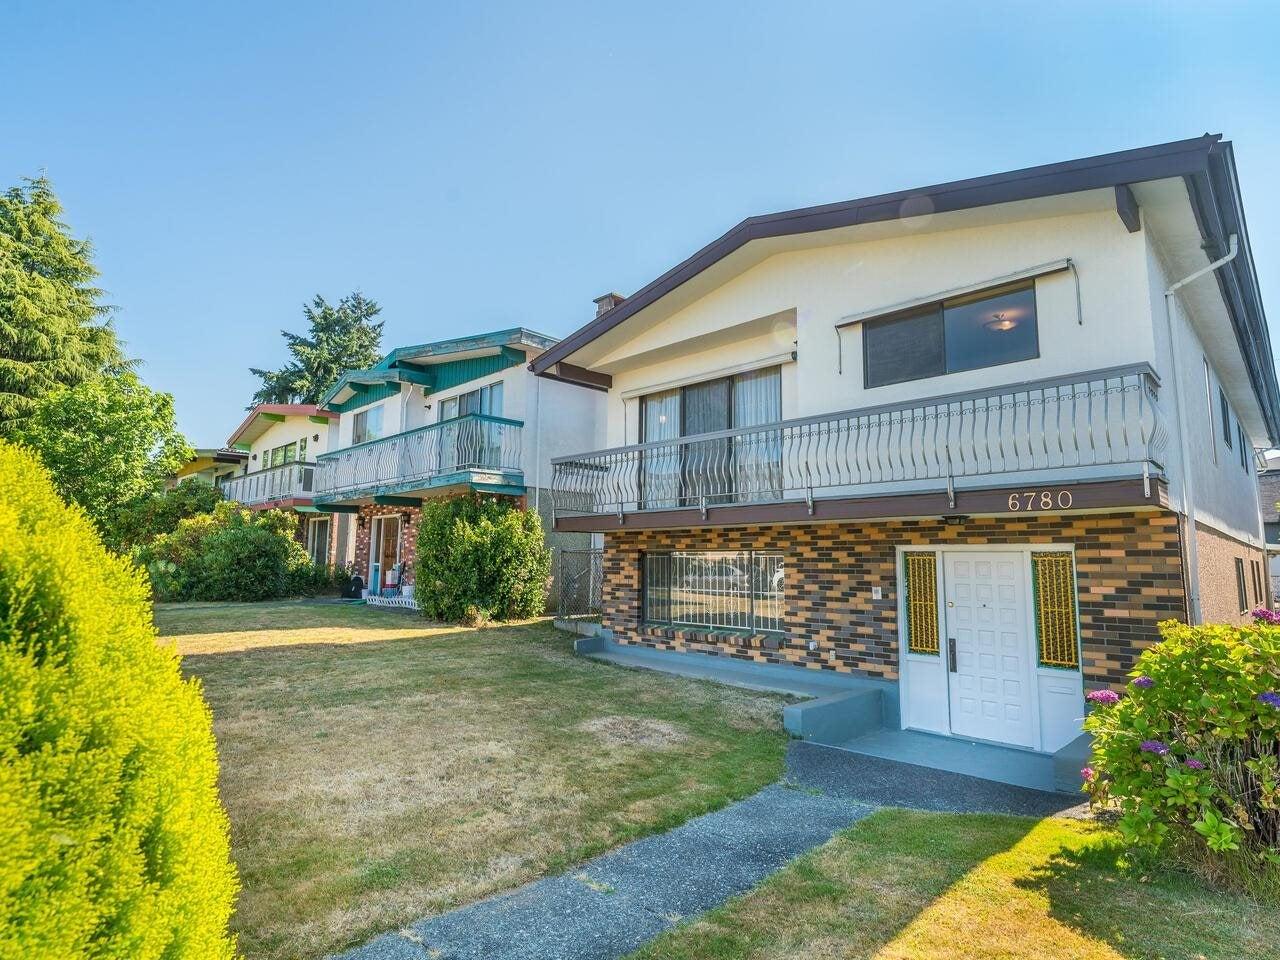 6780 LANARK STREET - Knight House/Single Family for sale, 6 Bedrooms (R2600028) - #1